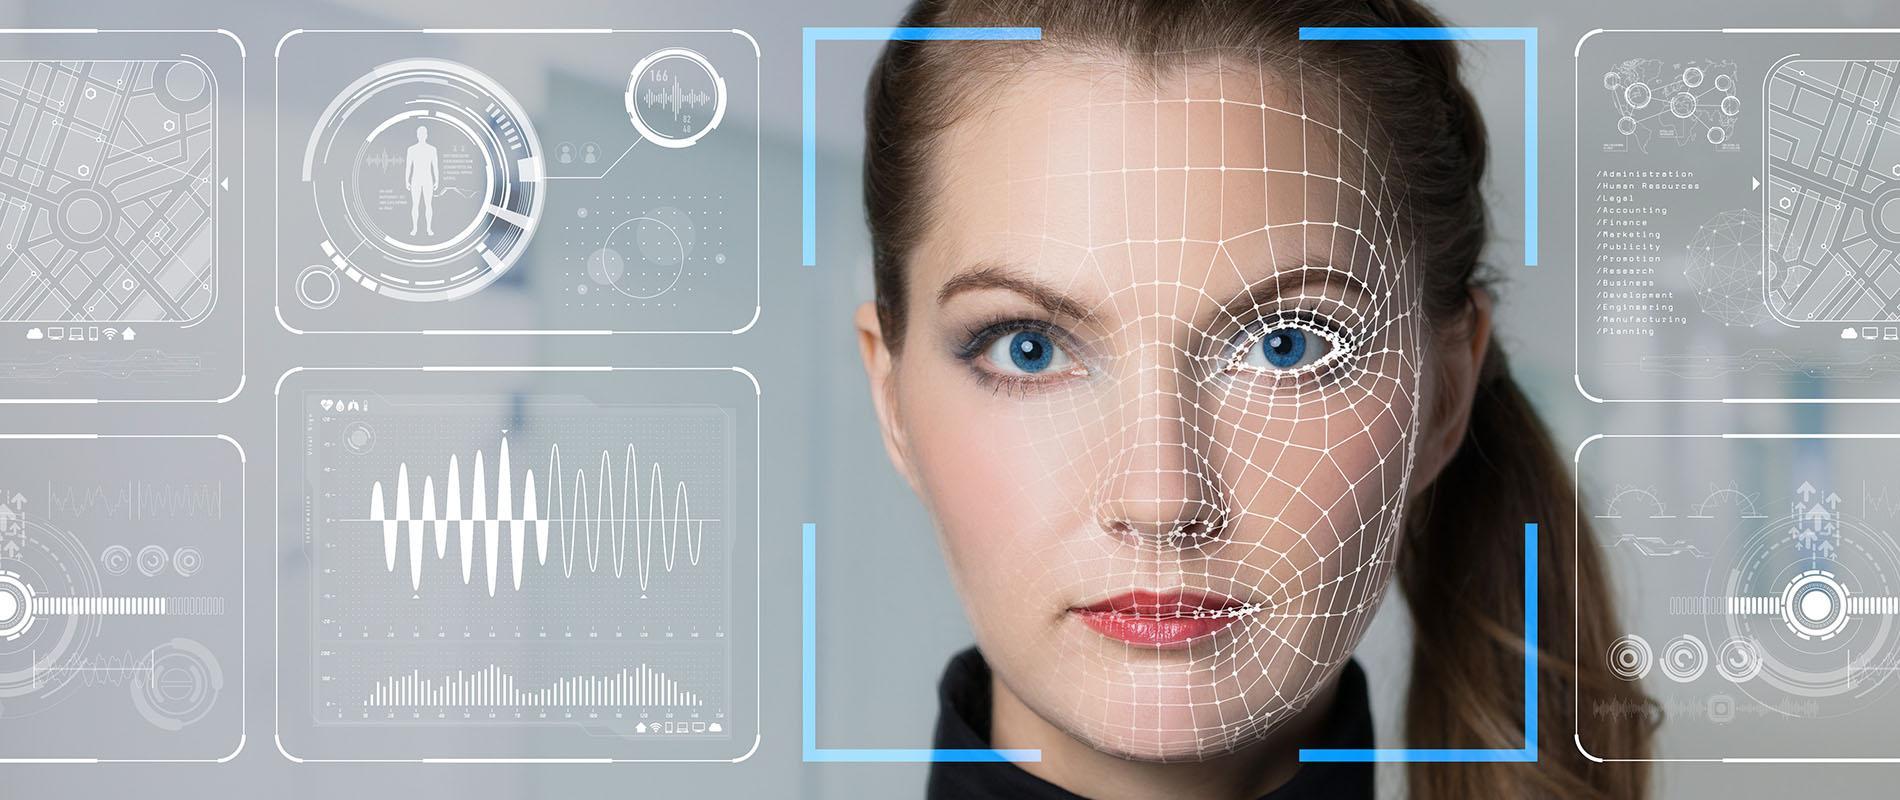 biometria-identidad-usuario-seguridad-banca-digital-tecnologia